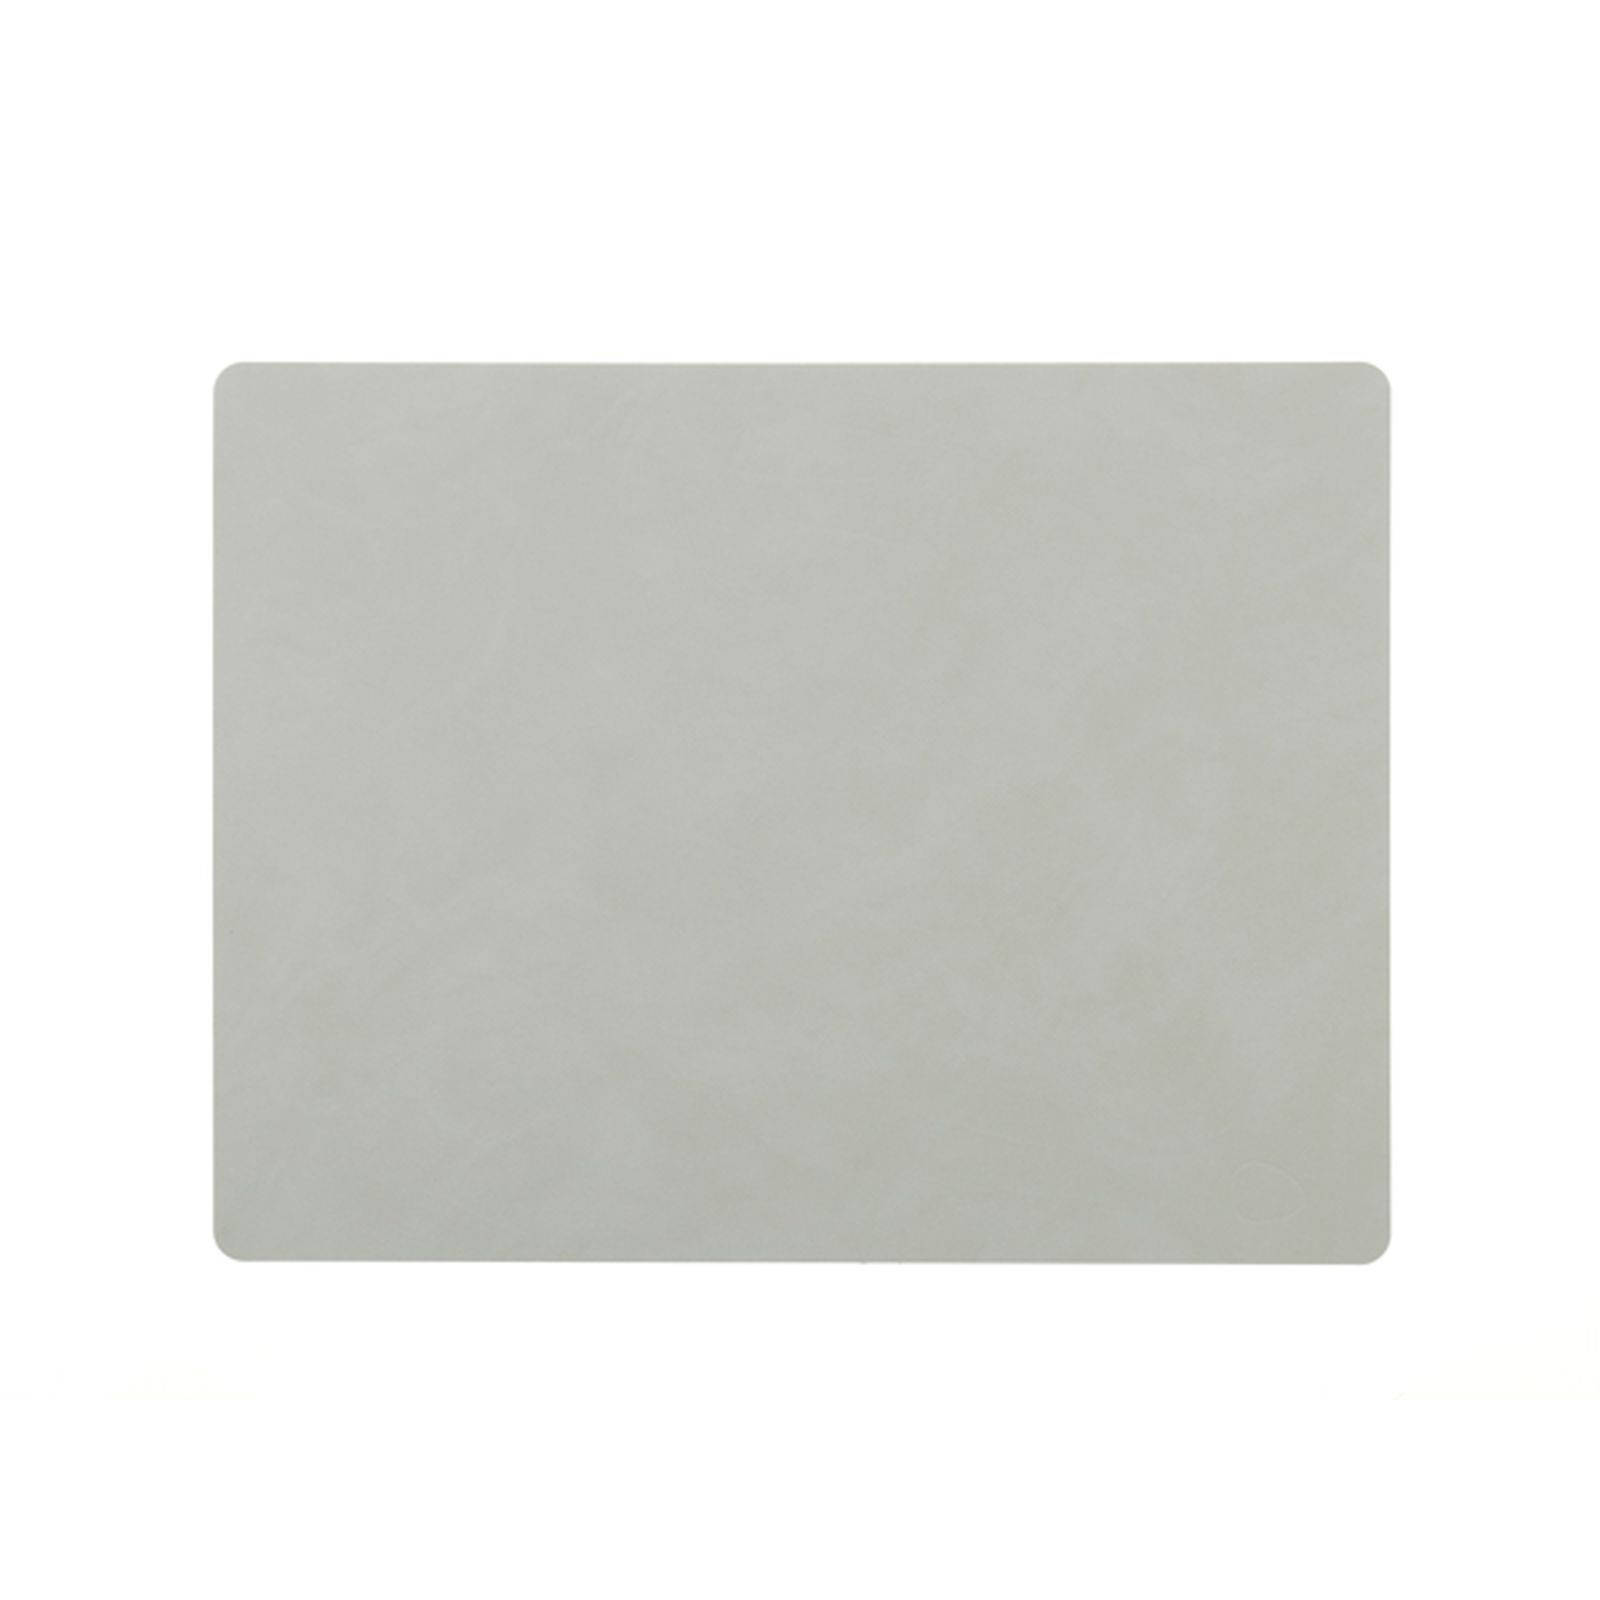 LIND DNA Nupo placemat square L metallic (steengrijs) online kopen